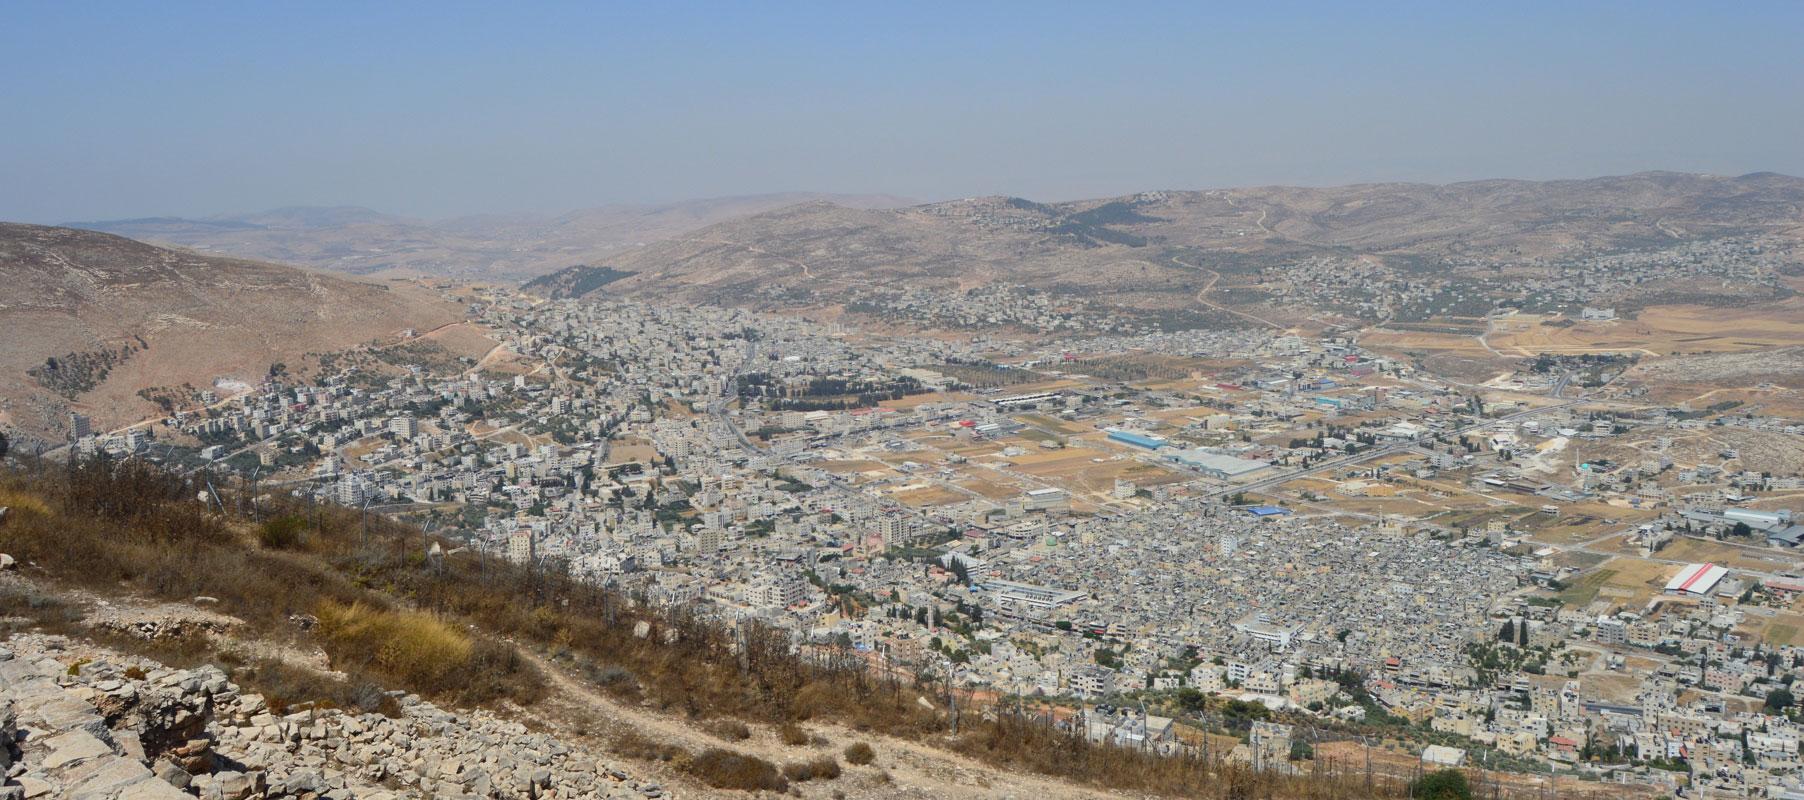 Nablus City, Palestine